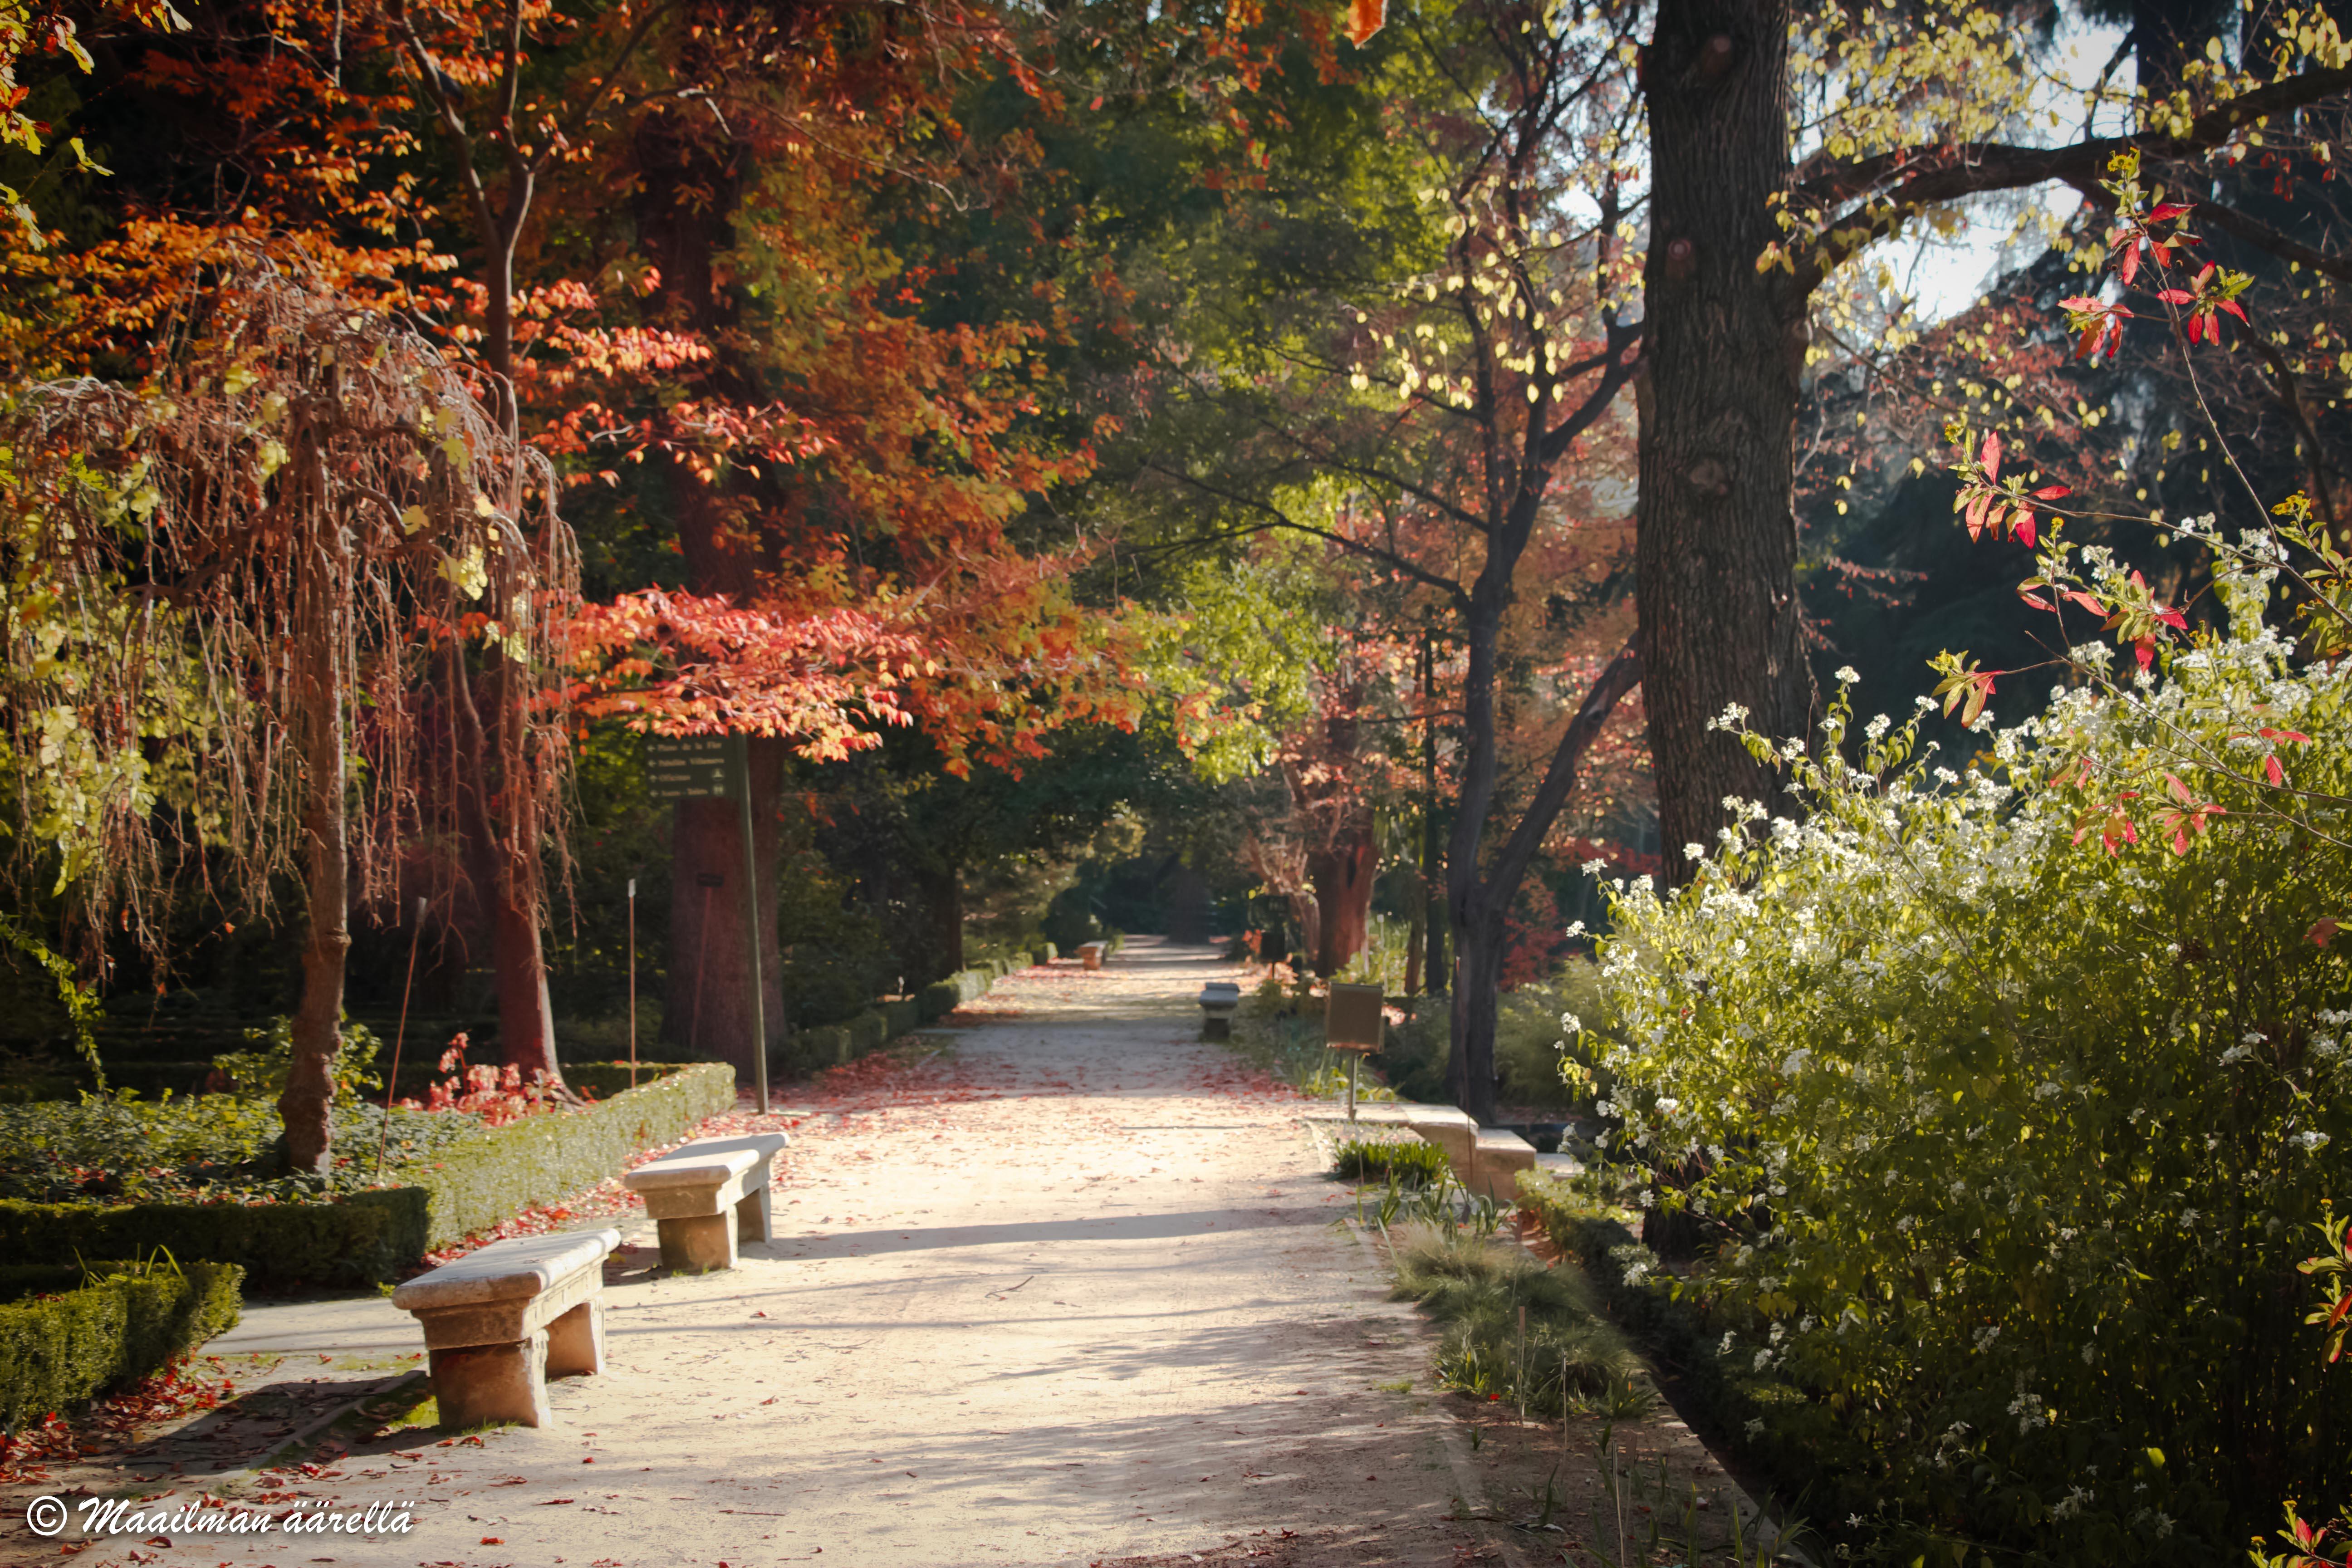 Real_Jardin_Botanico-1-4